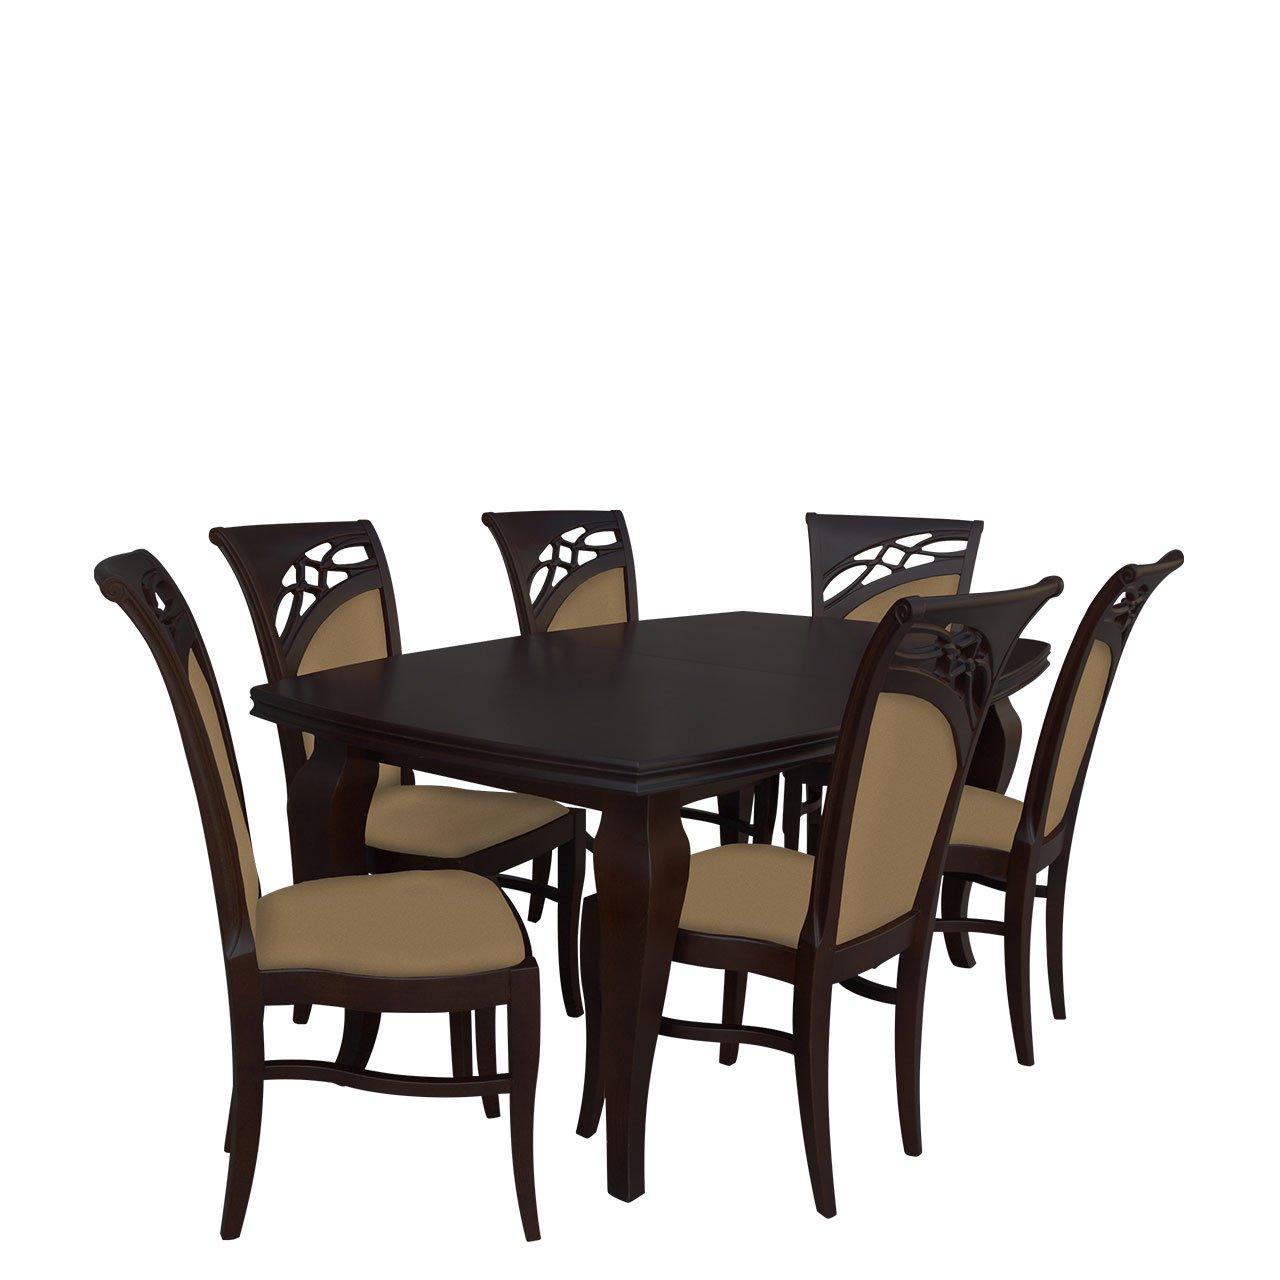 Asztal szék komplett RB027 butor mirjan24.hu